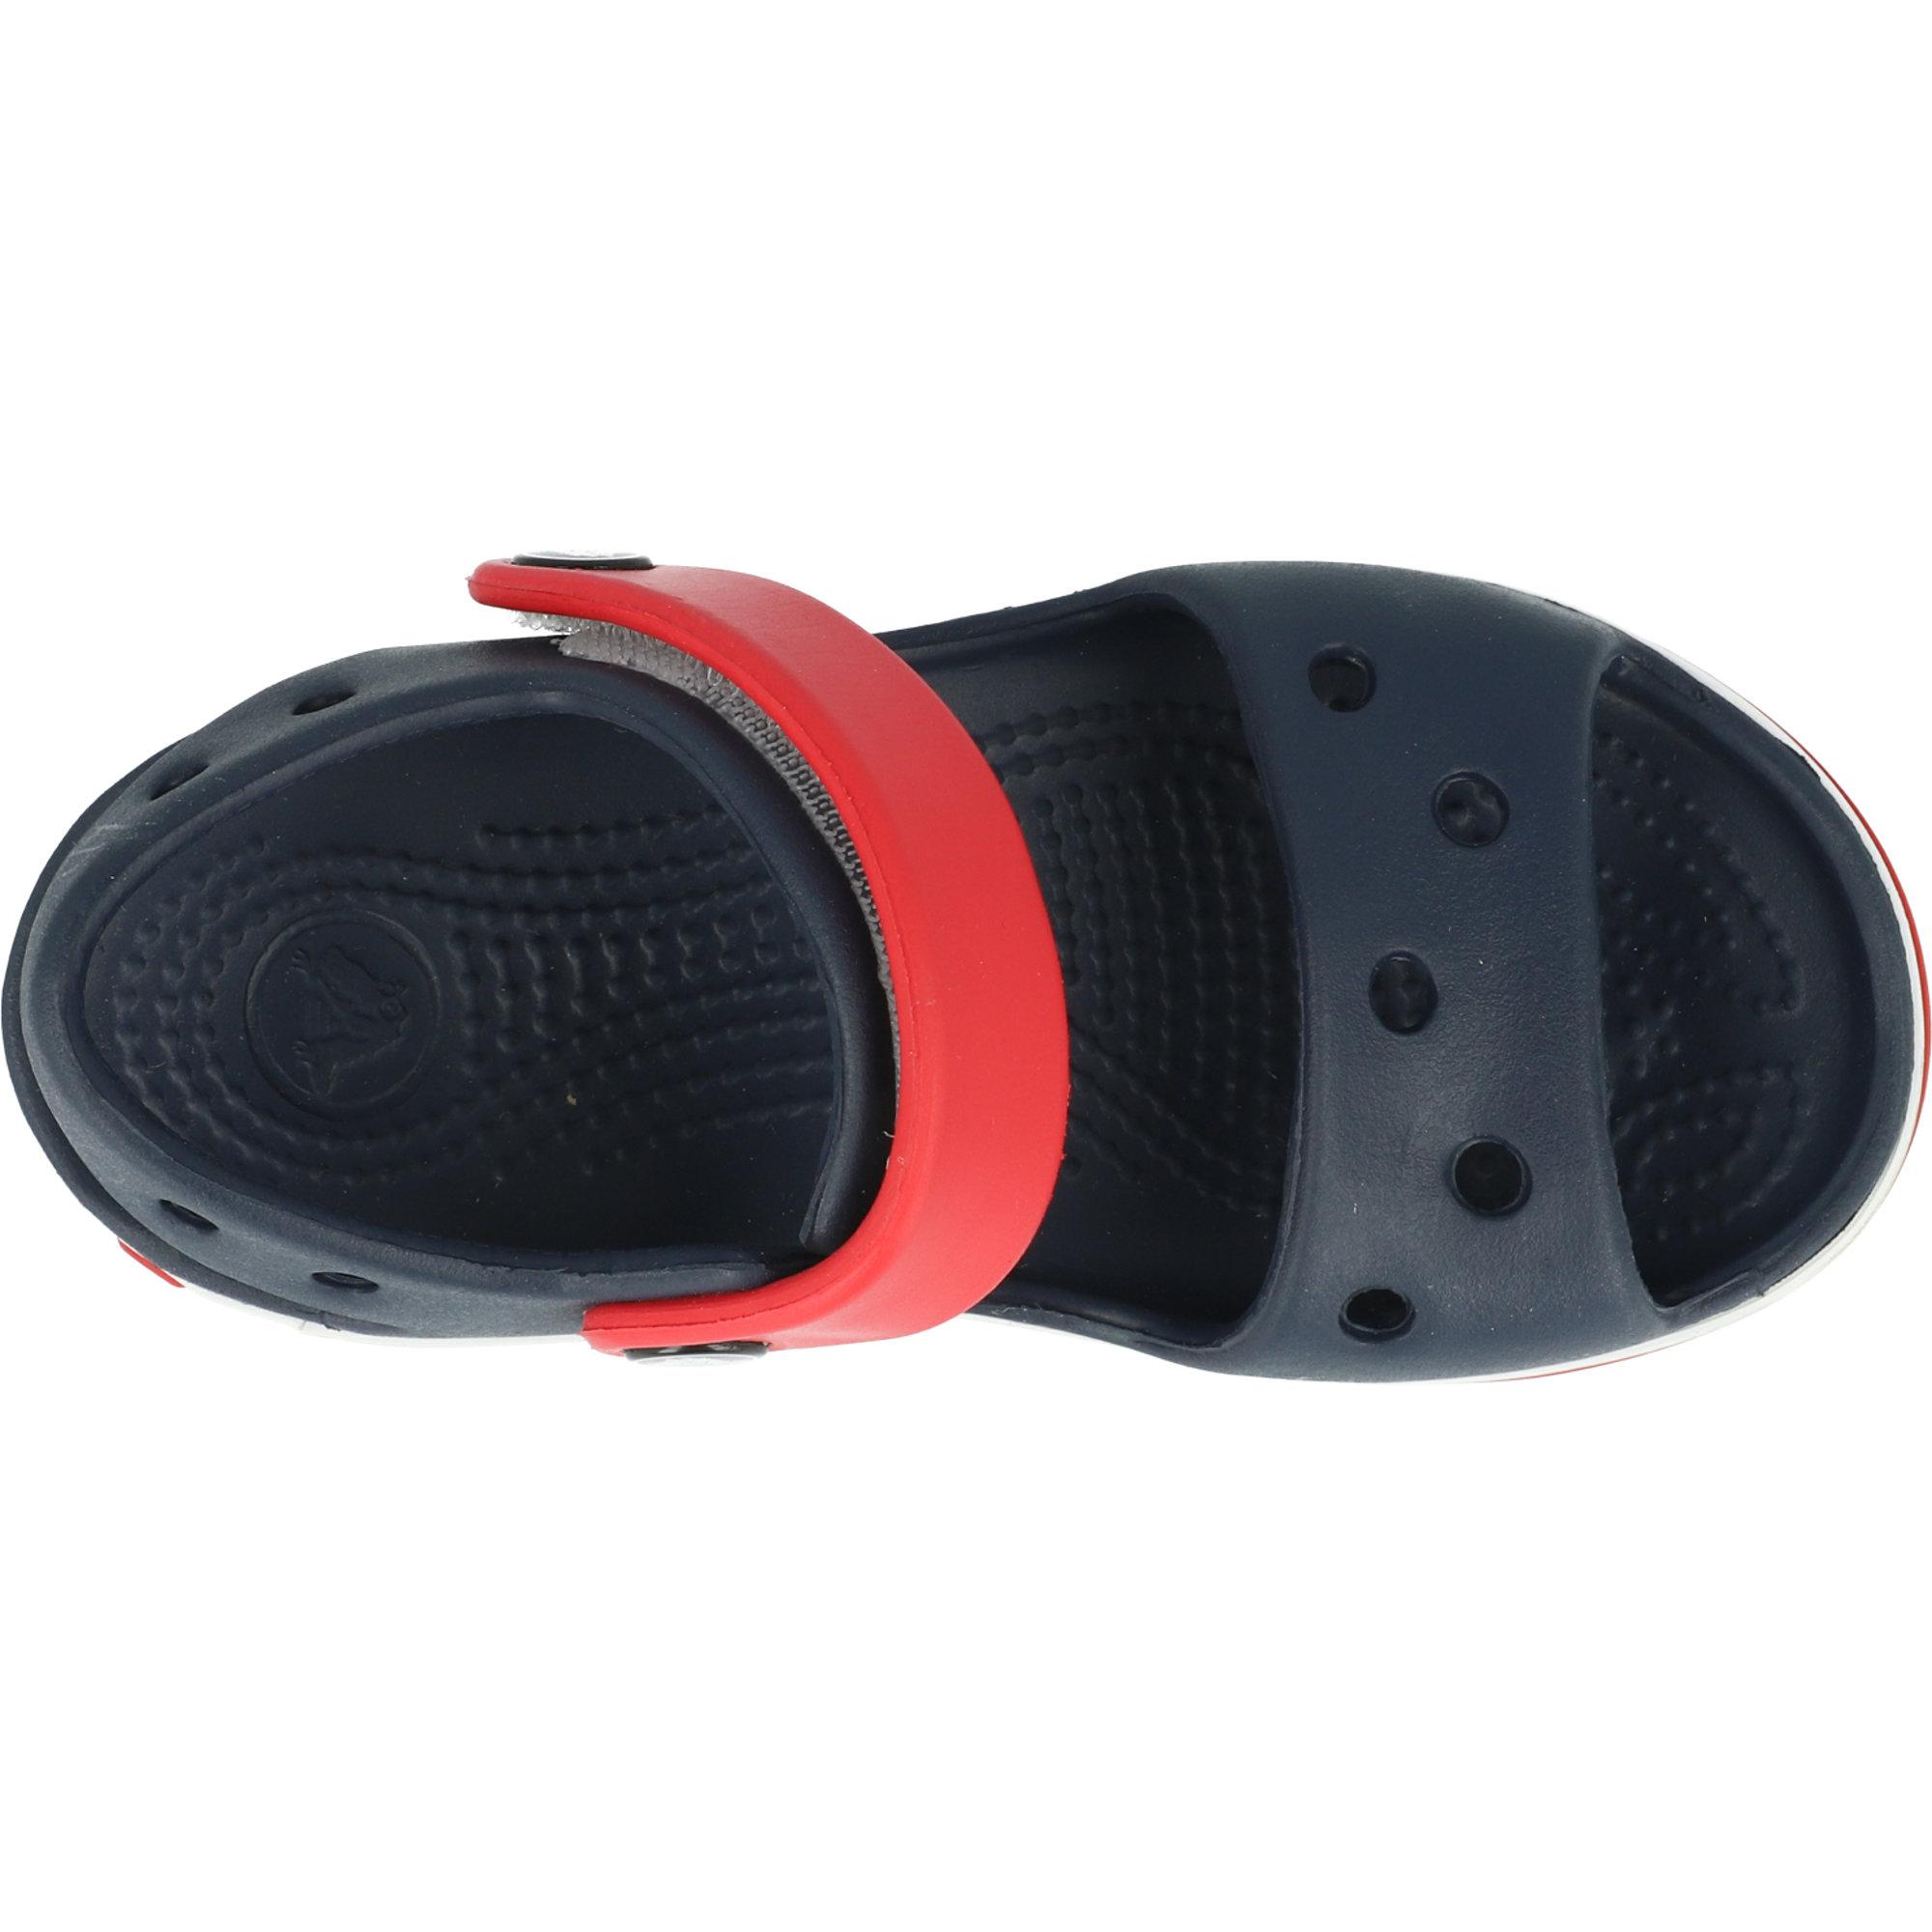 Crocs Crocband Sandal Kids Navy/Red Croslite